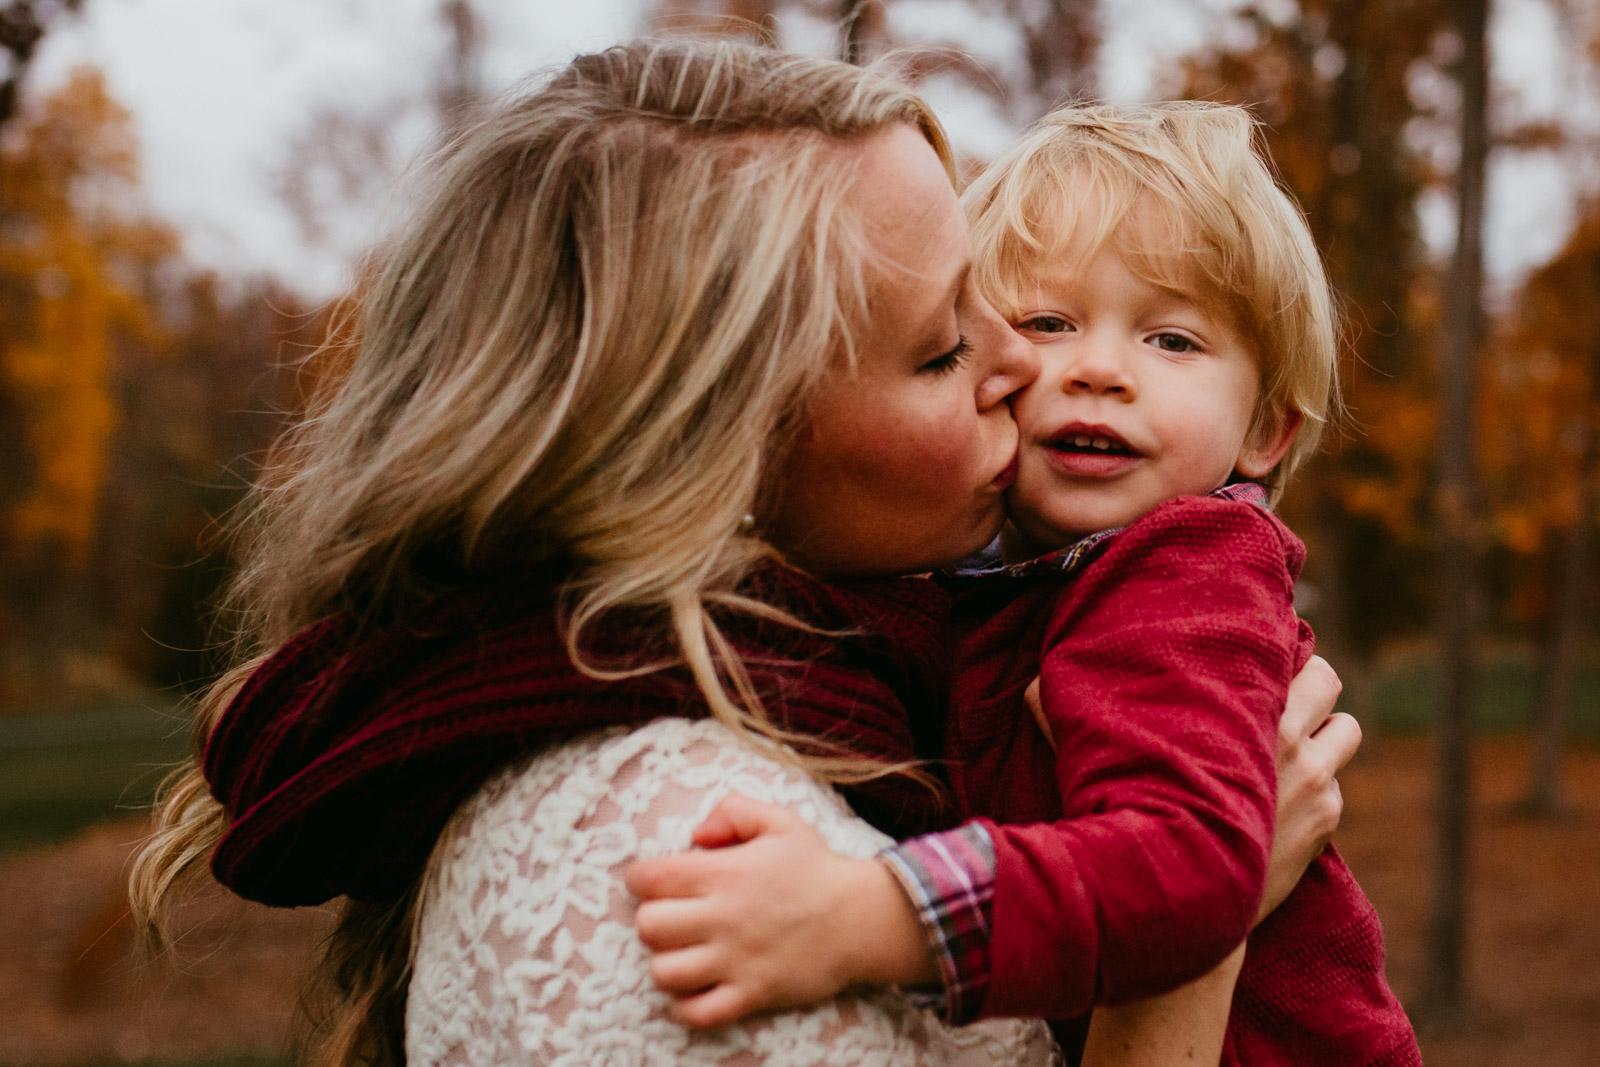 Mom kissing toddler son at The Barn at One Loudoun, Ashburn, Virginia in the fall